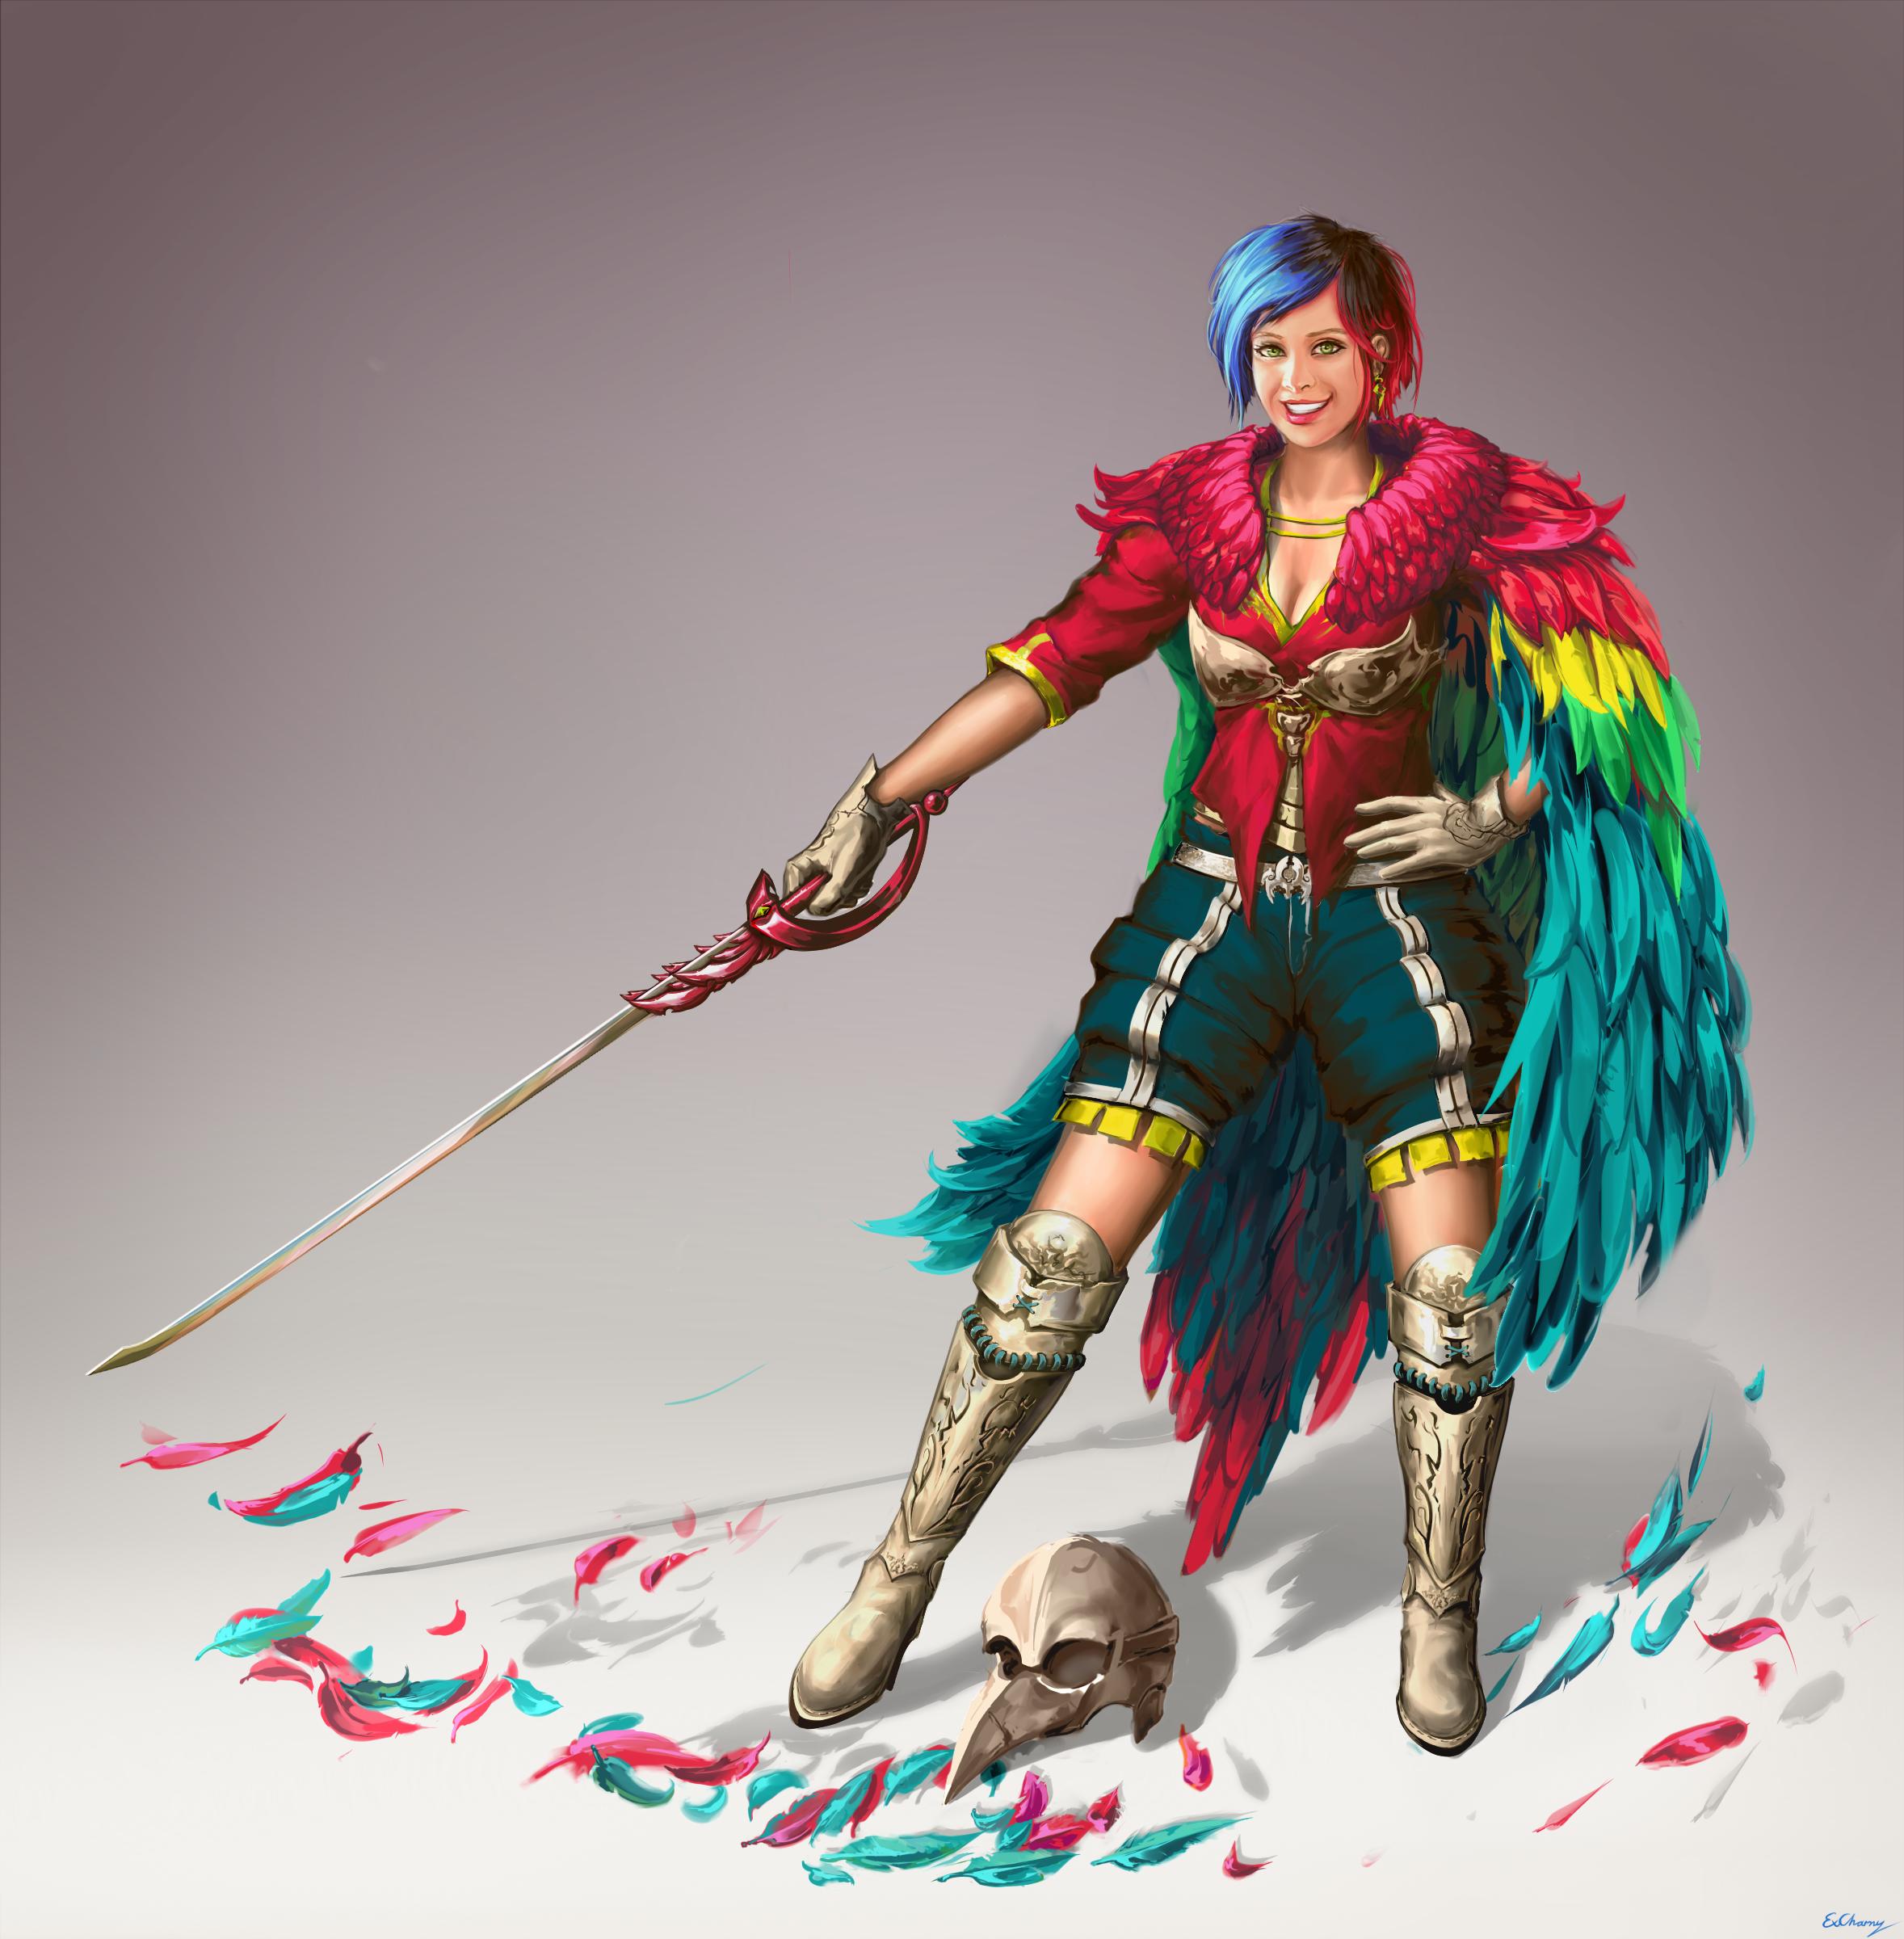 Parrot Knight